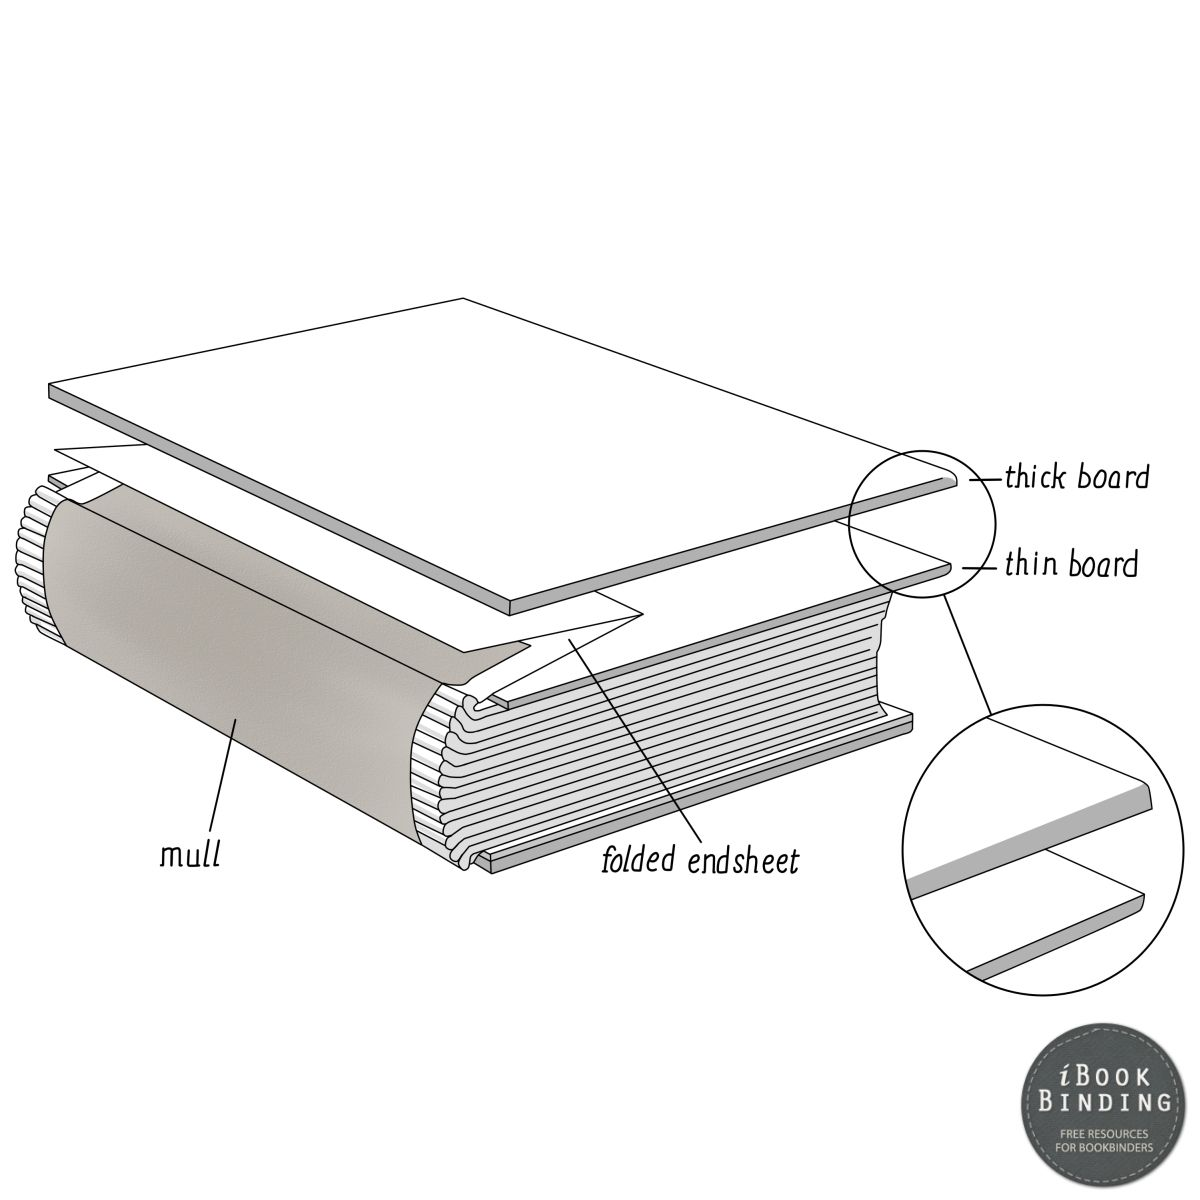 11. Making Split Cover Boards For Larger Books